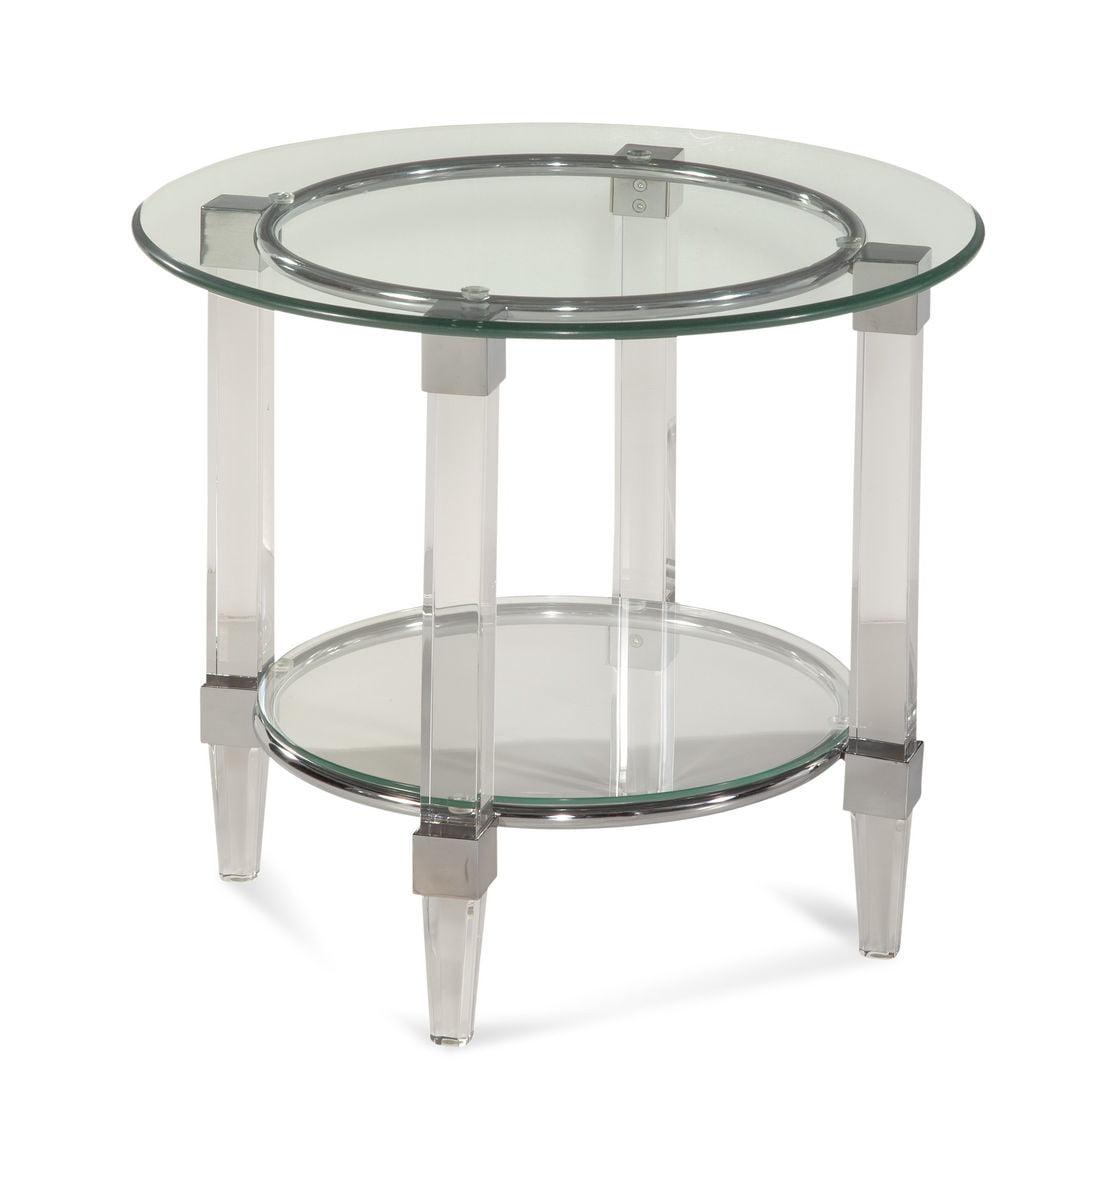 Bassett Hollywood Glam Cristal Round End Table by Bassett Mirror